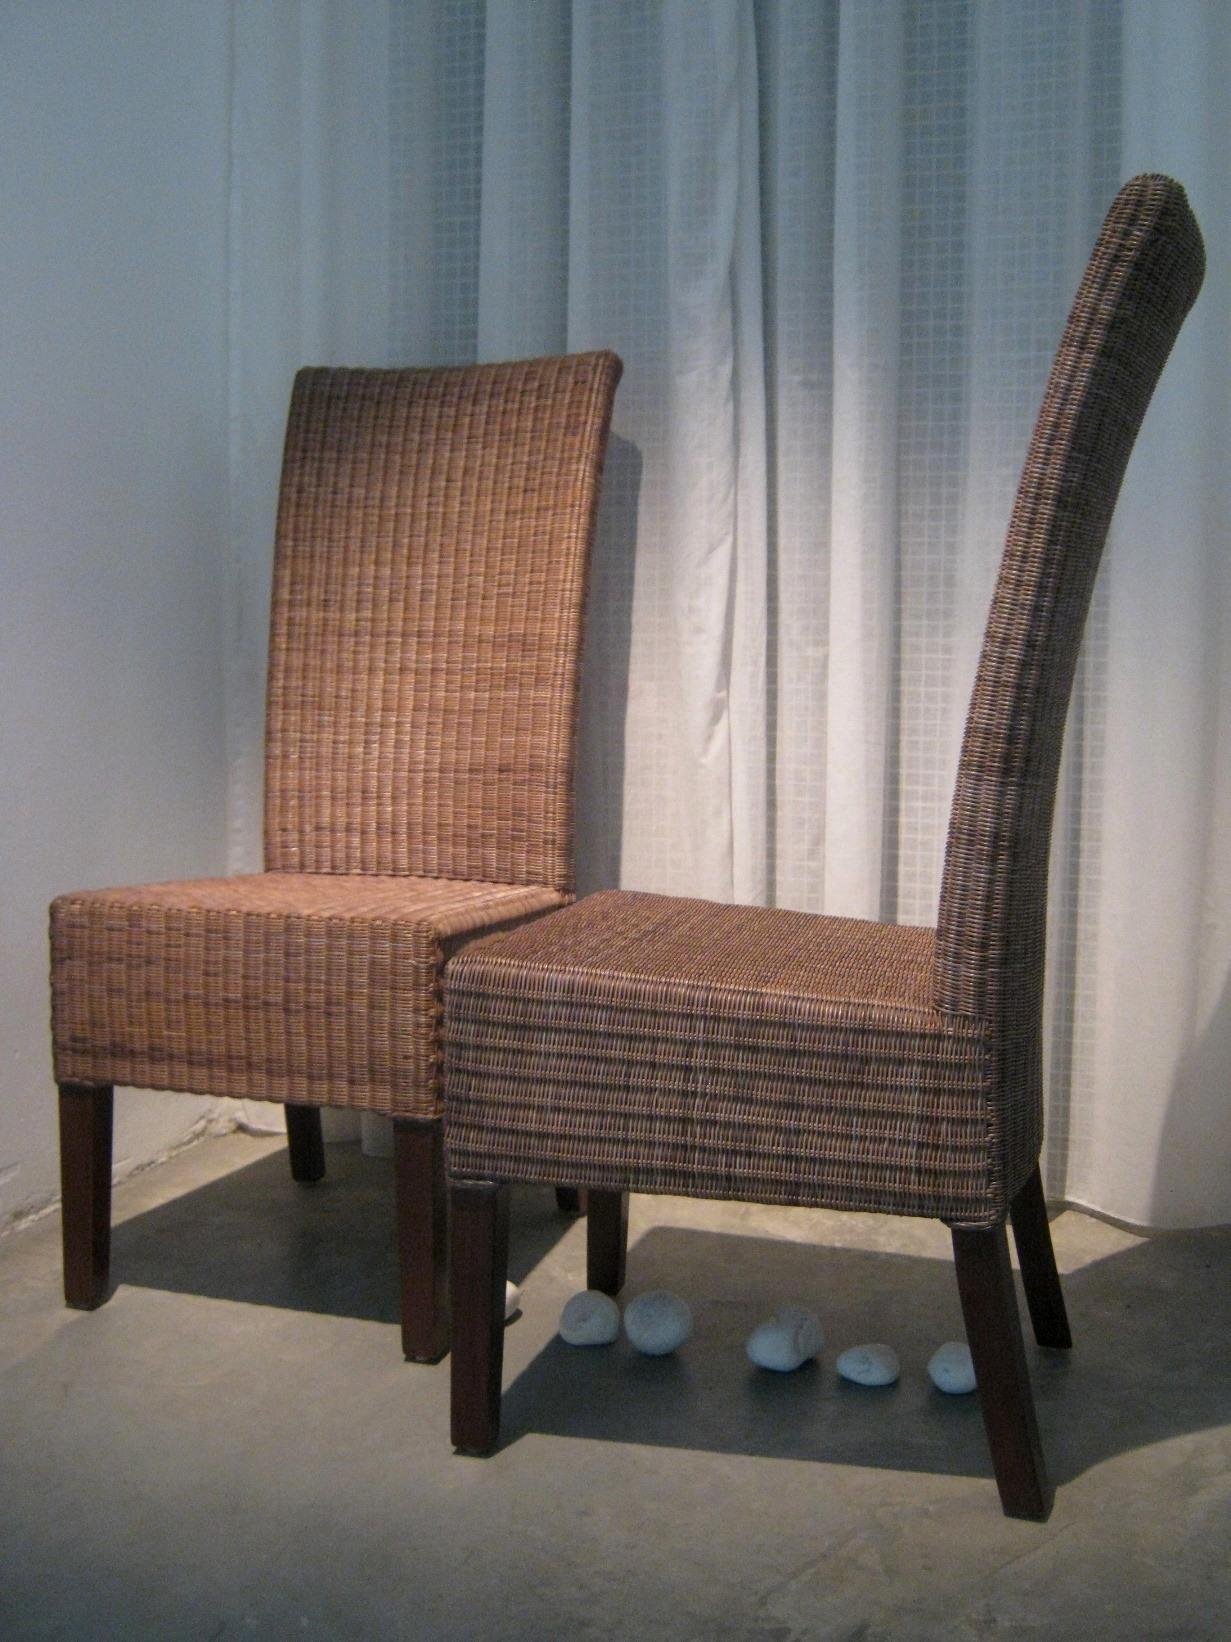 Sedia Becara Becara outlet , set 4 sedie midollino - Sedie a prezzi scontati